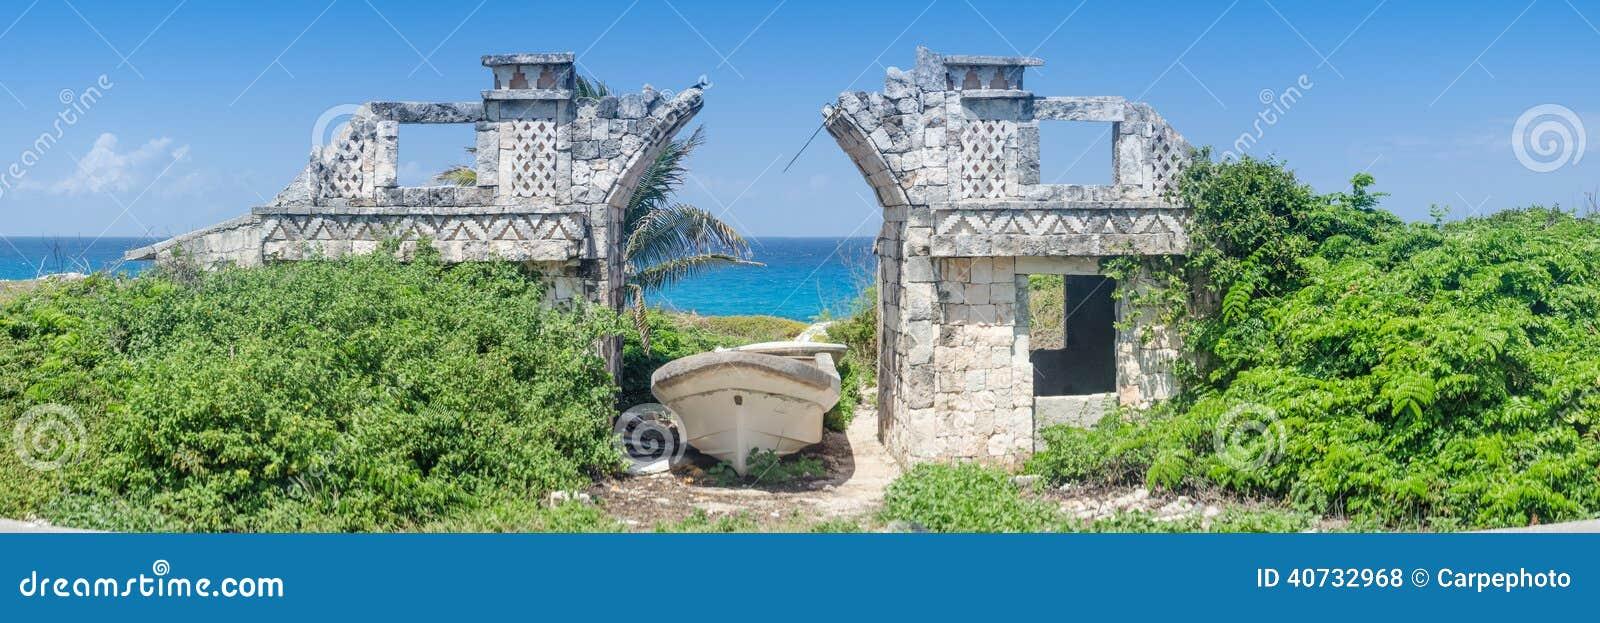 Panoramic of old ruins, boat, and ocean.